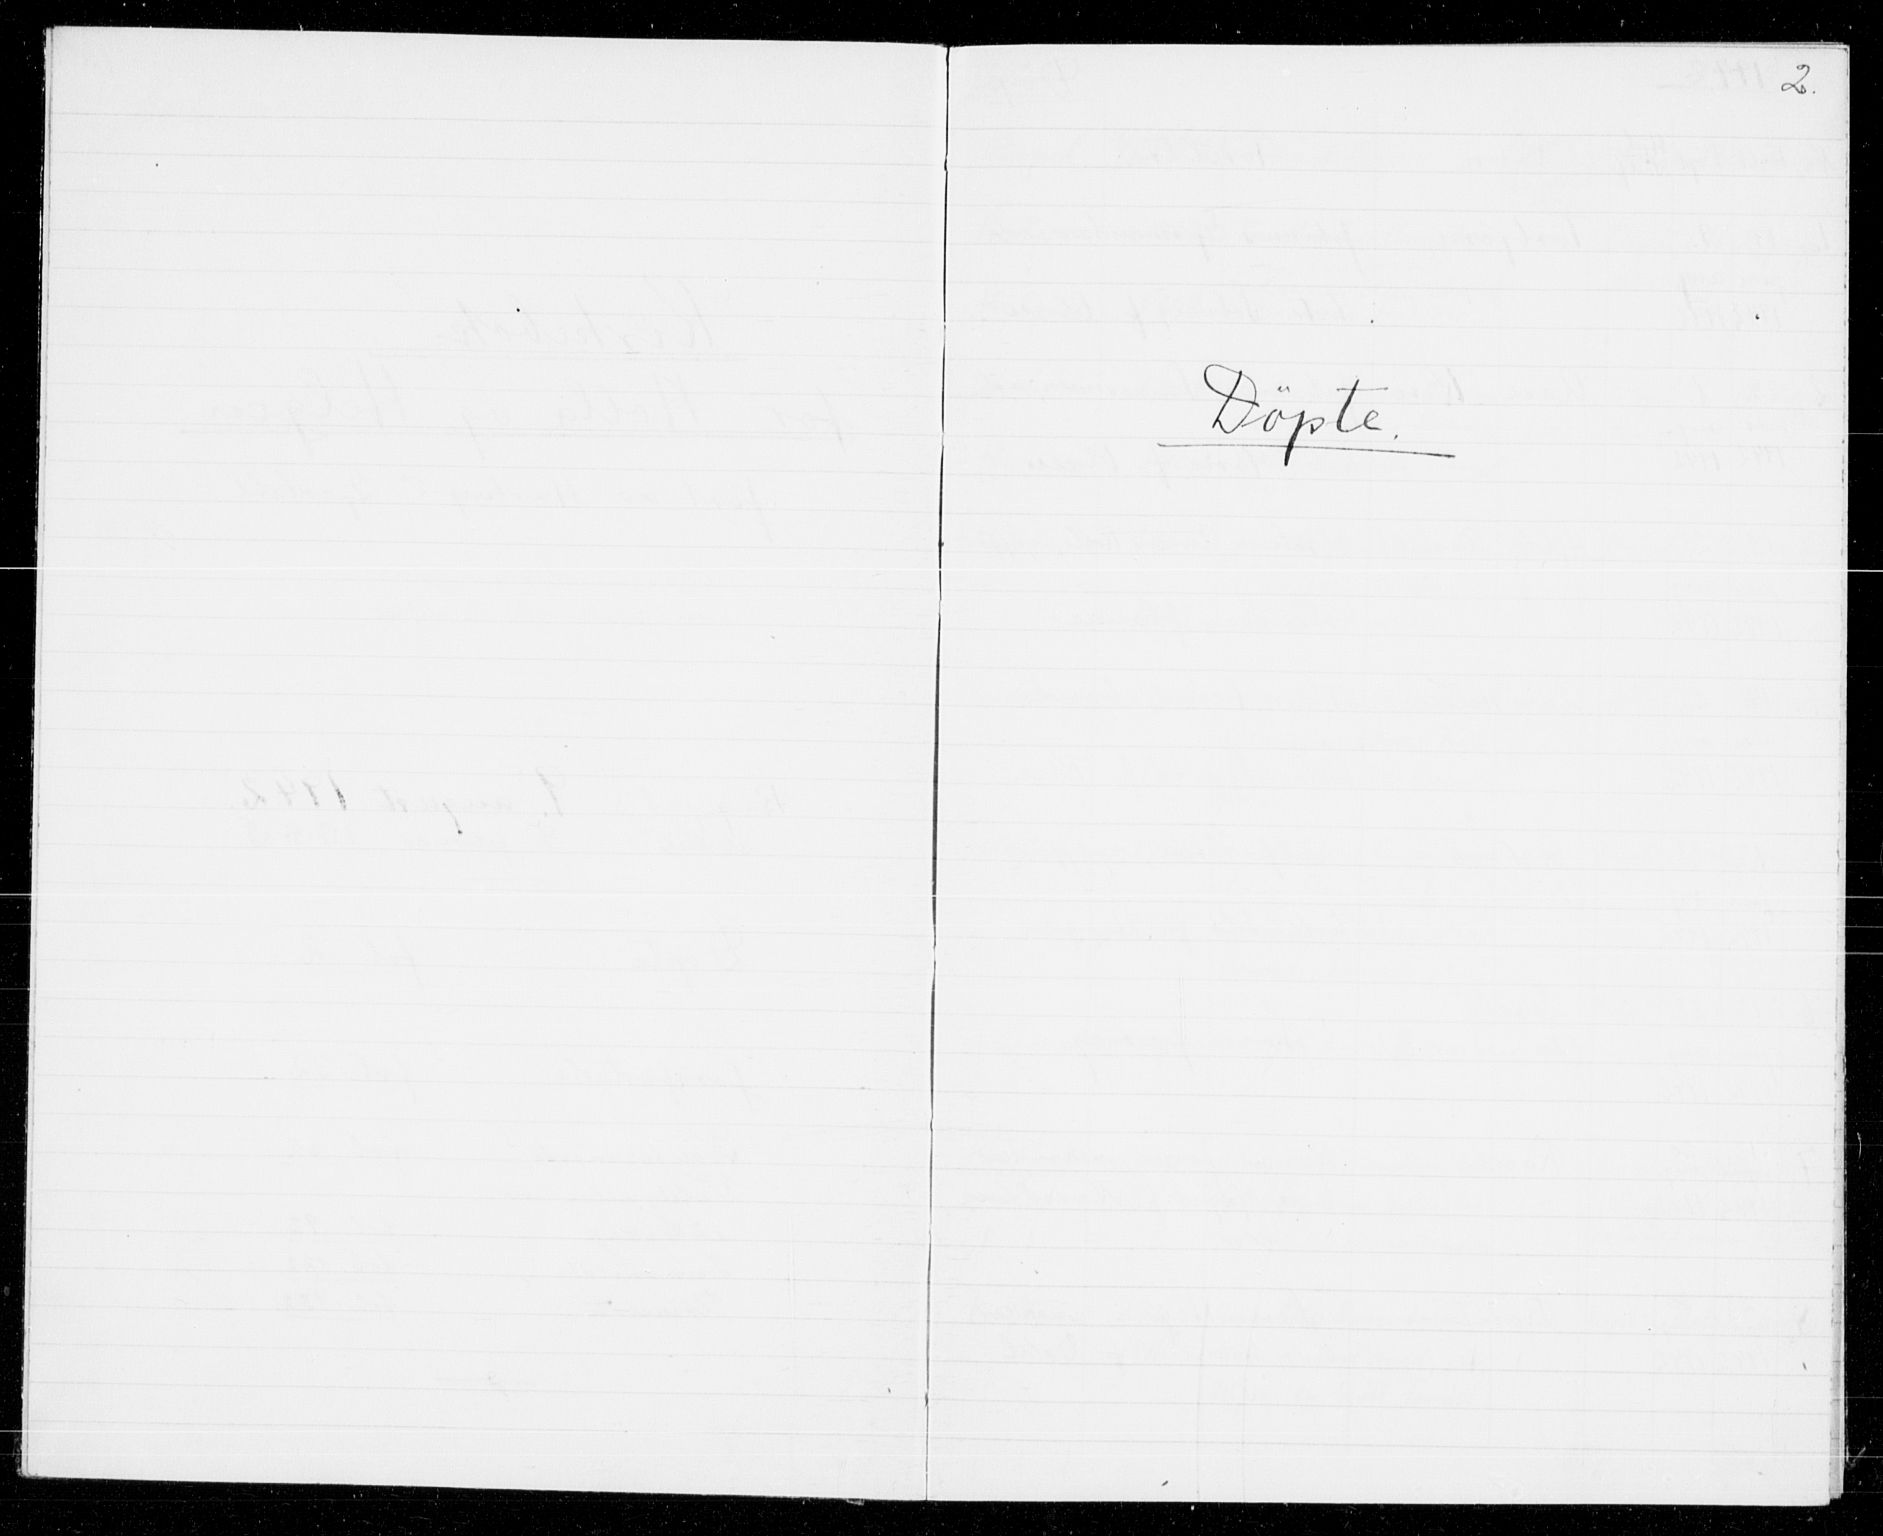 SAKO, Holla kirkebøker, G/Gb/L0004: Klokkerbok nr. II 4, 1942-1943, s. 2